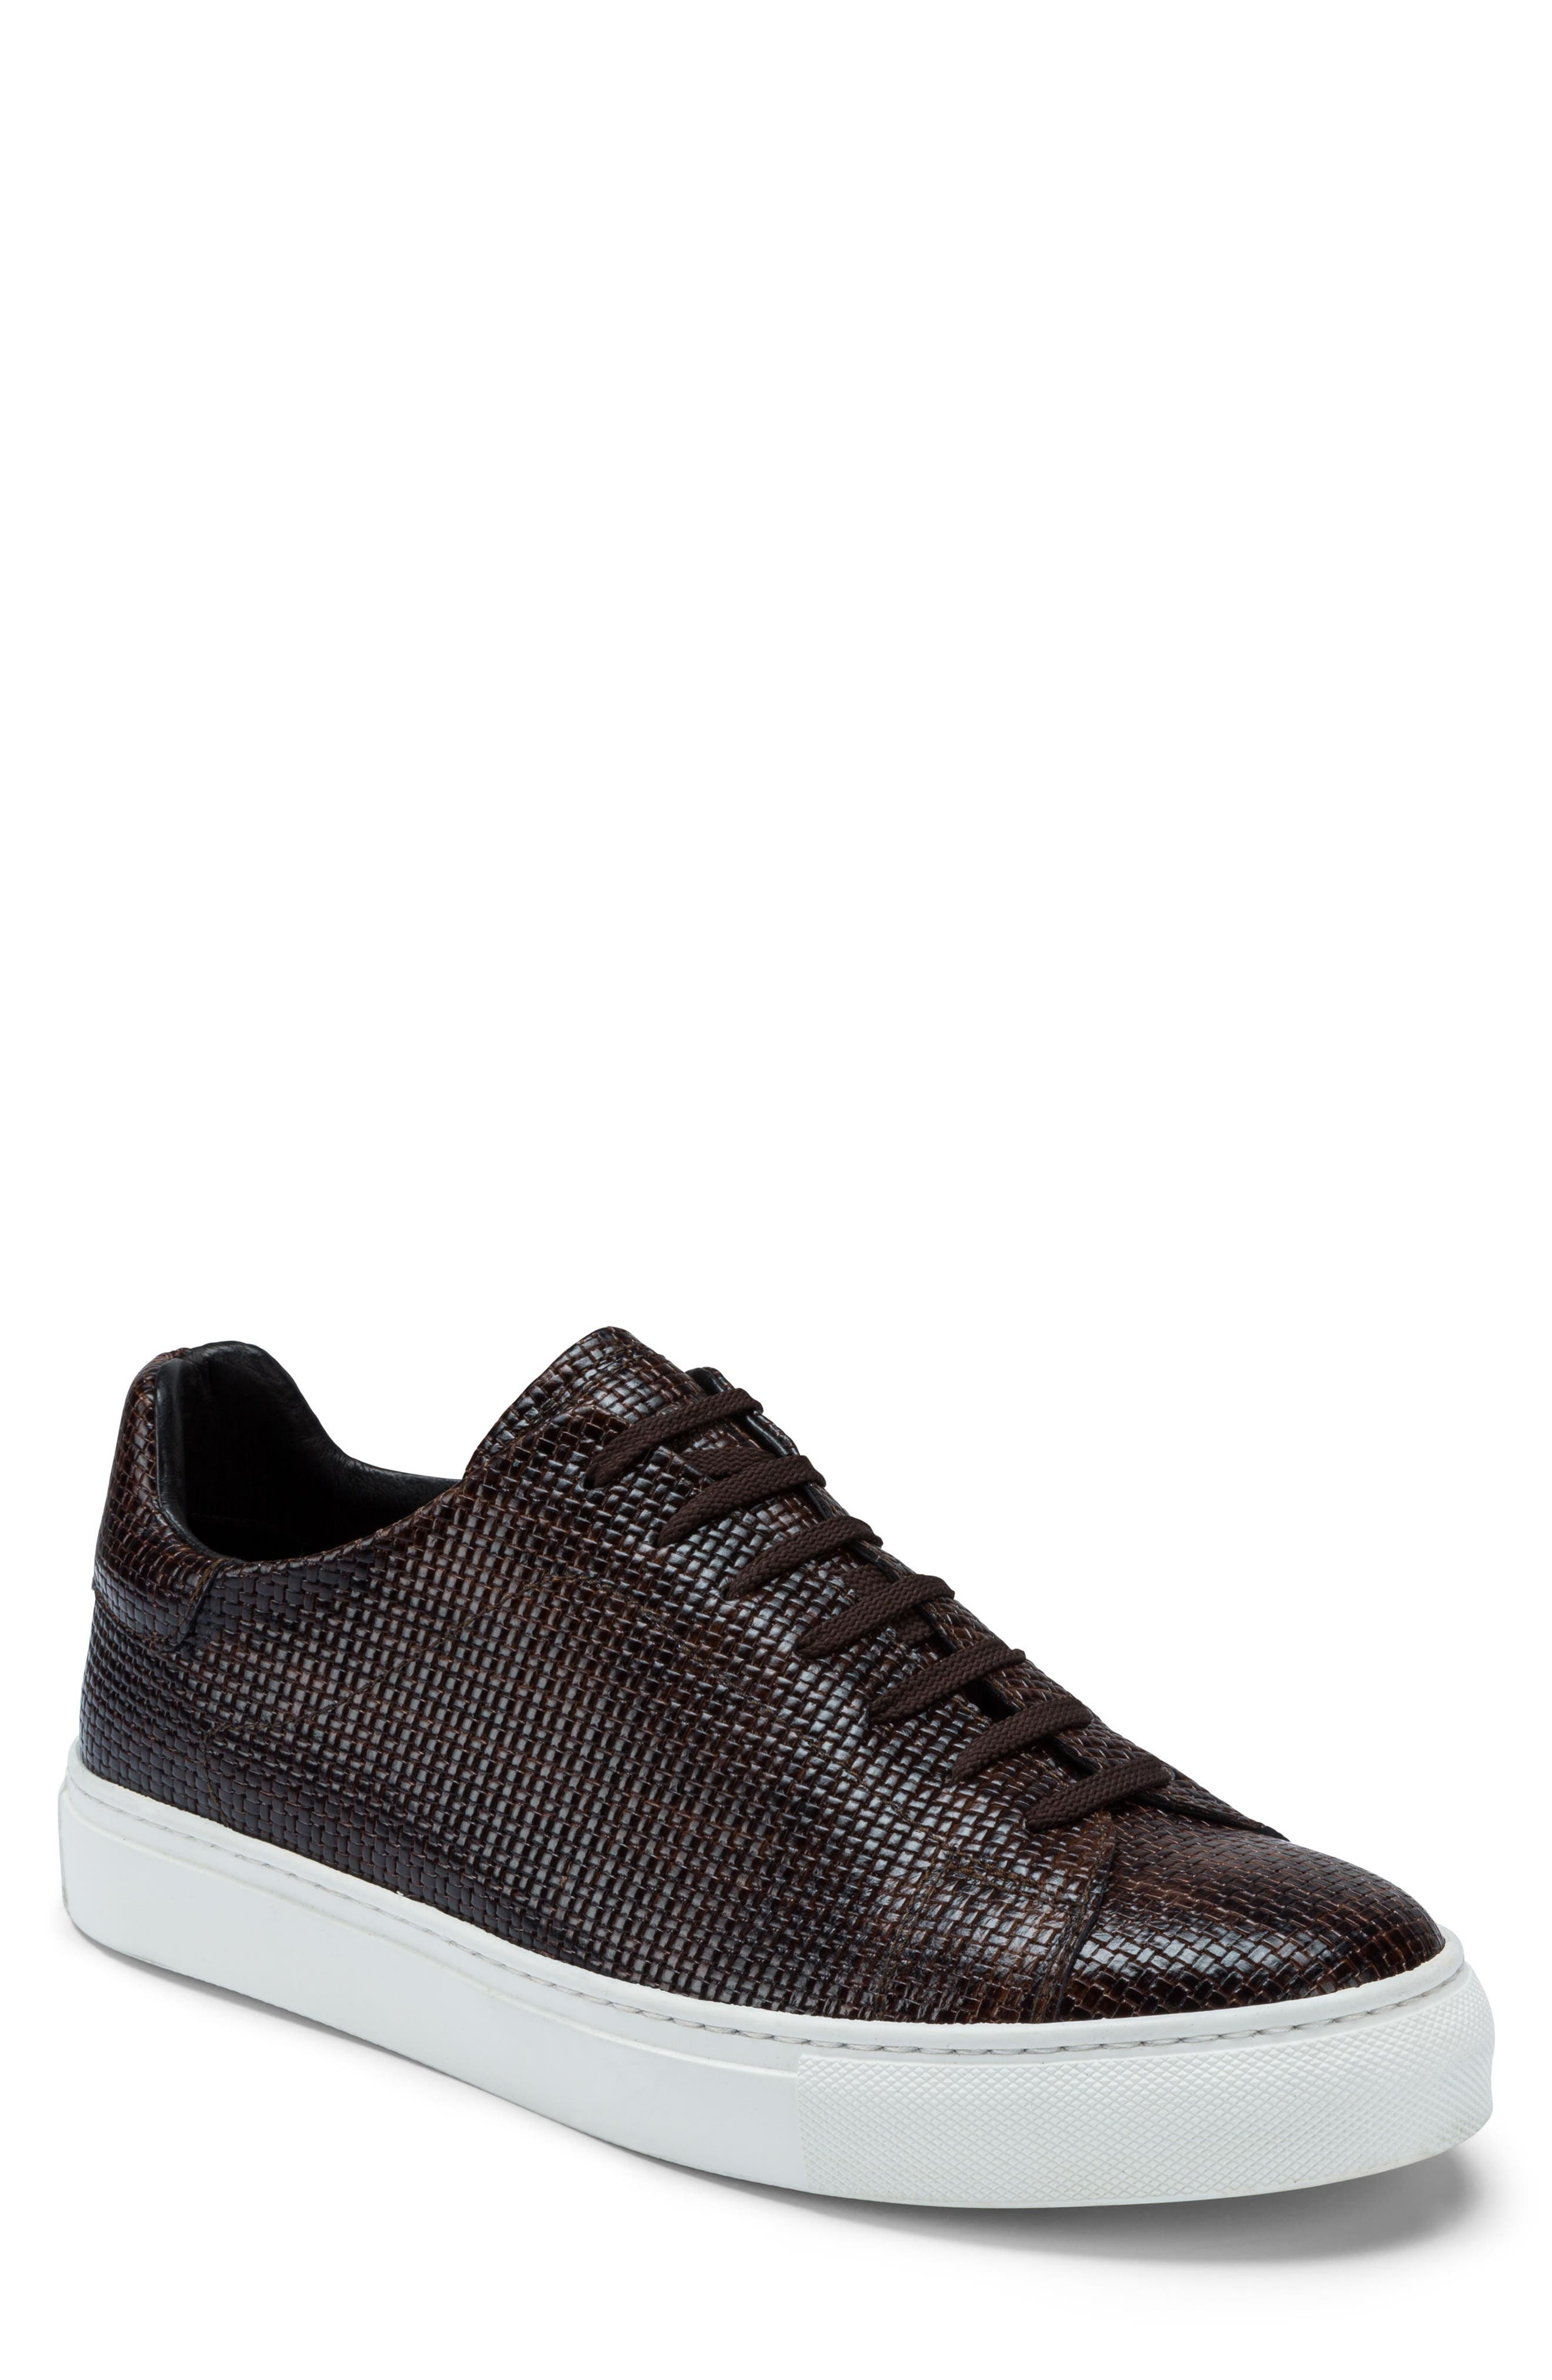 Wimbledon Sneaker,                         Main,                         color, 203